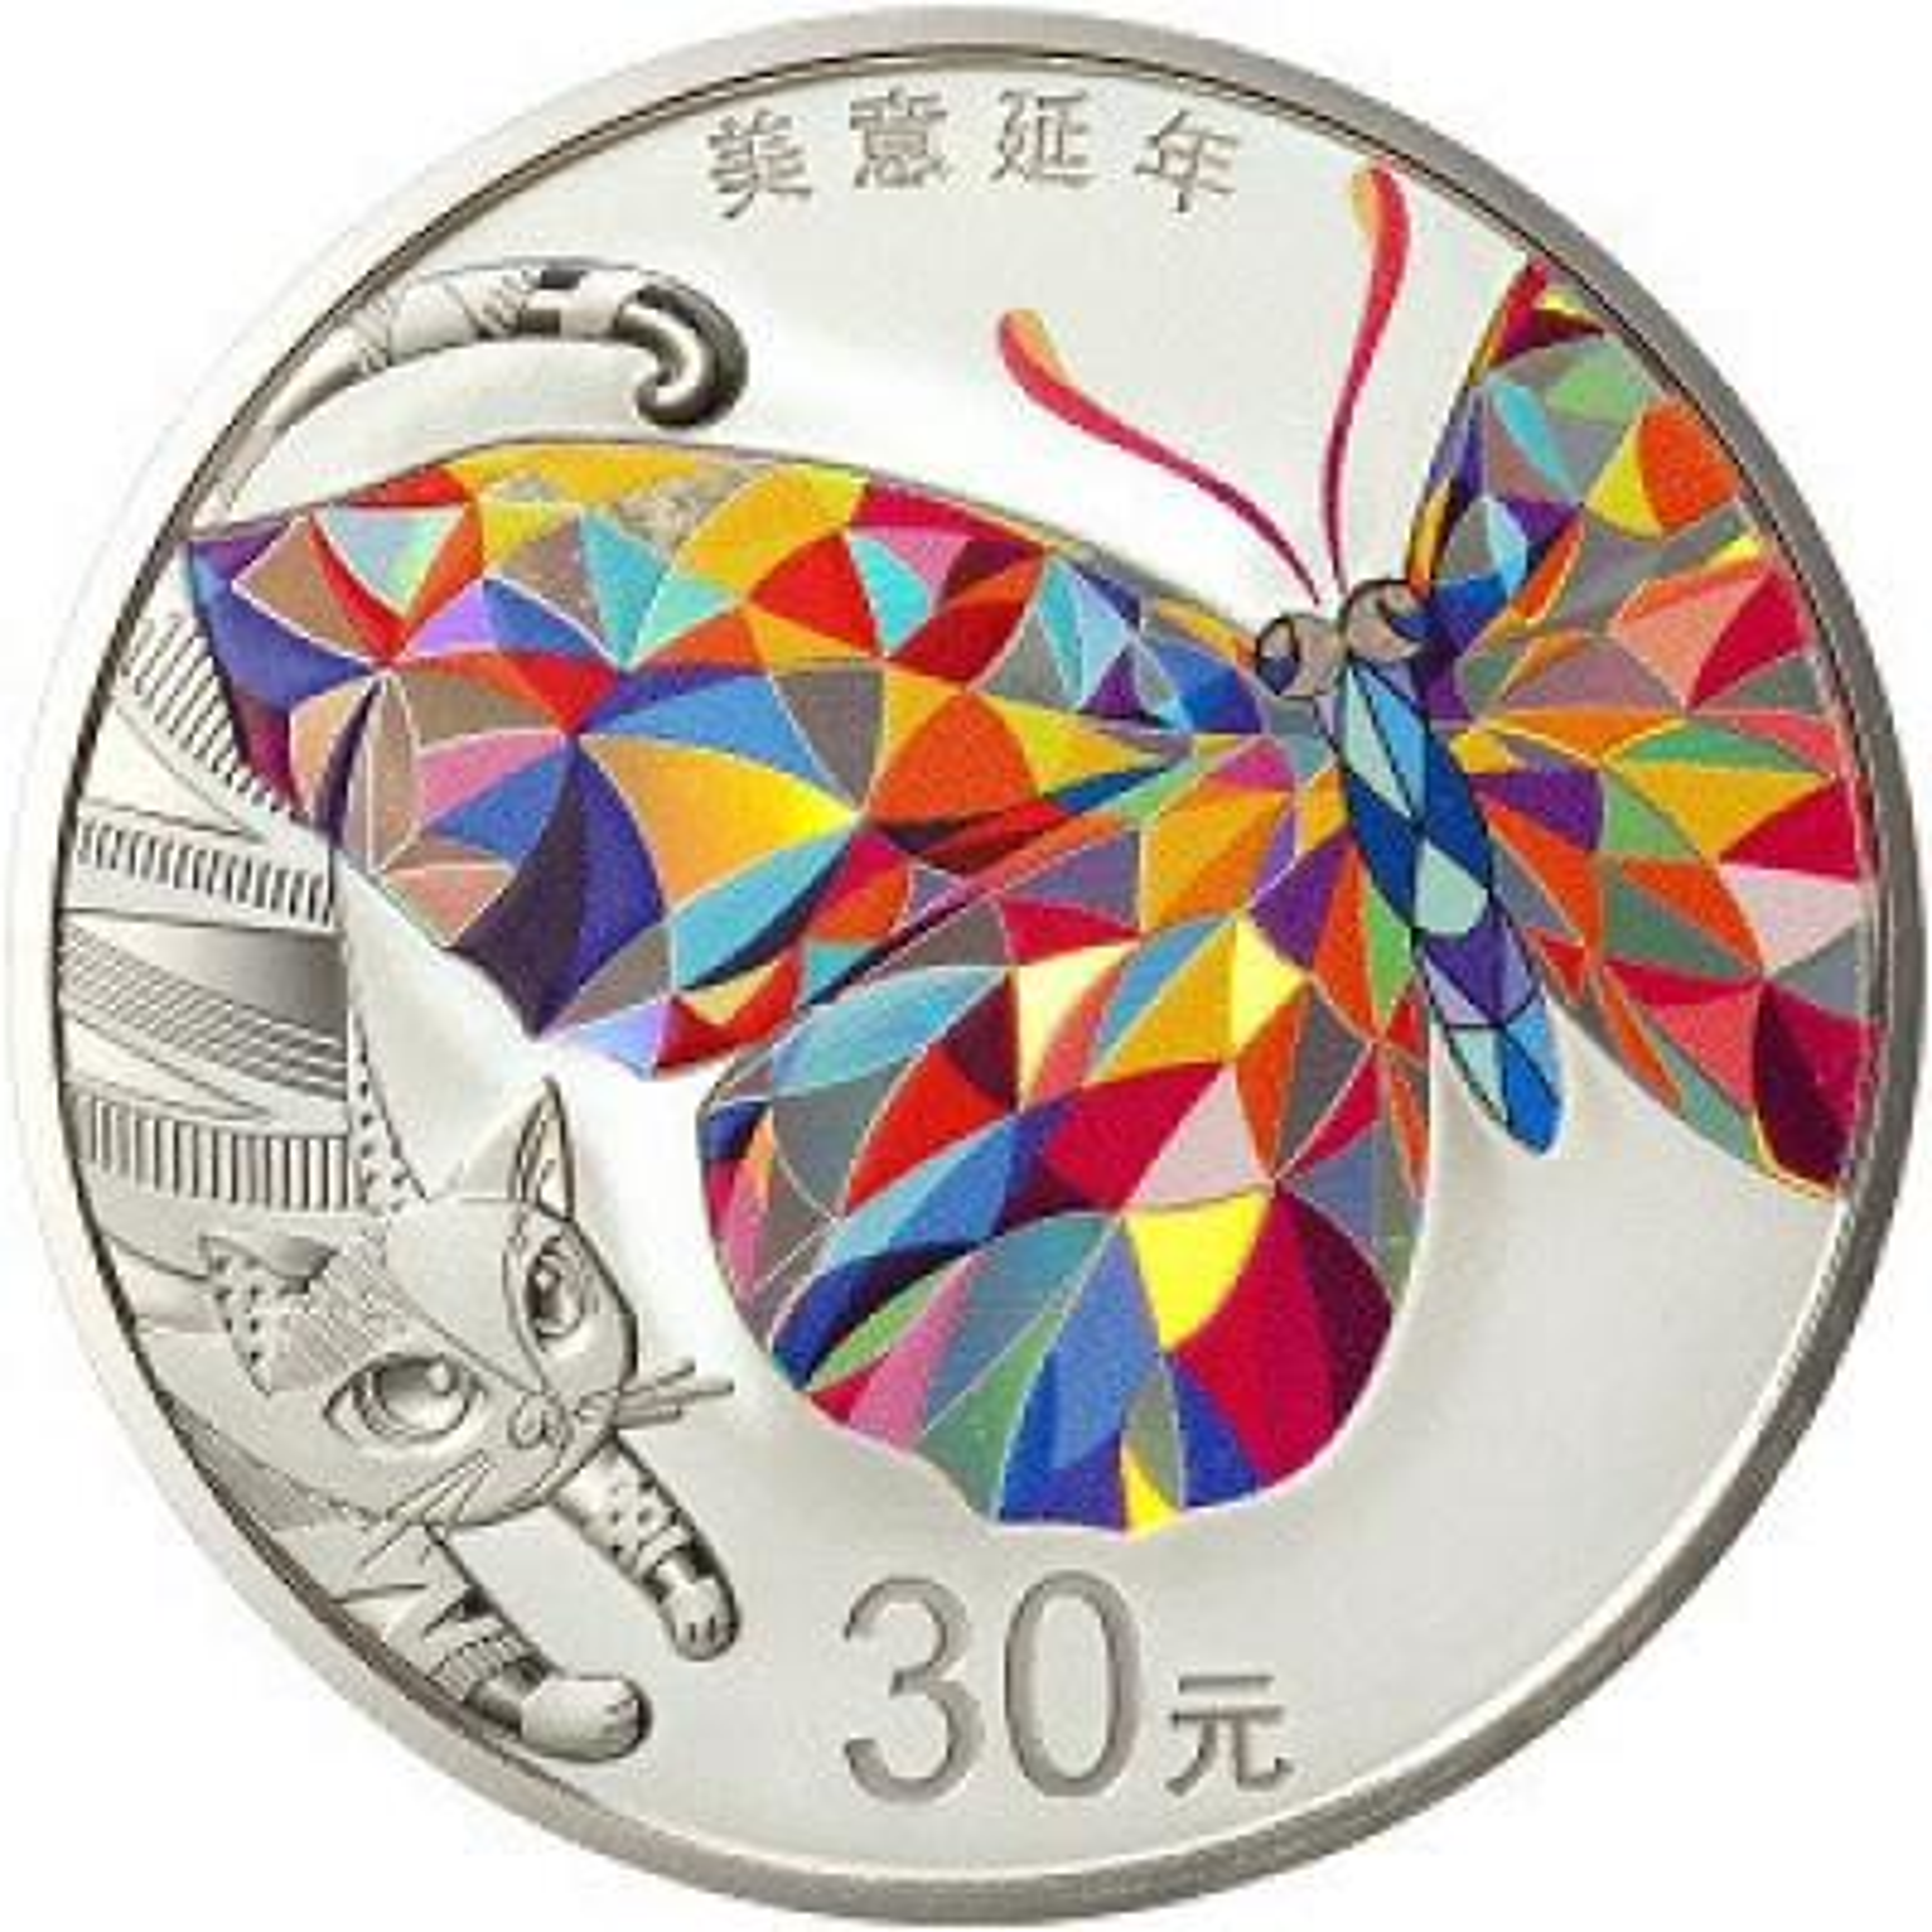 Zilveren munt gunstige cultuur levensduur 2021 proof